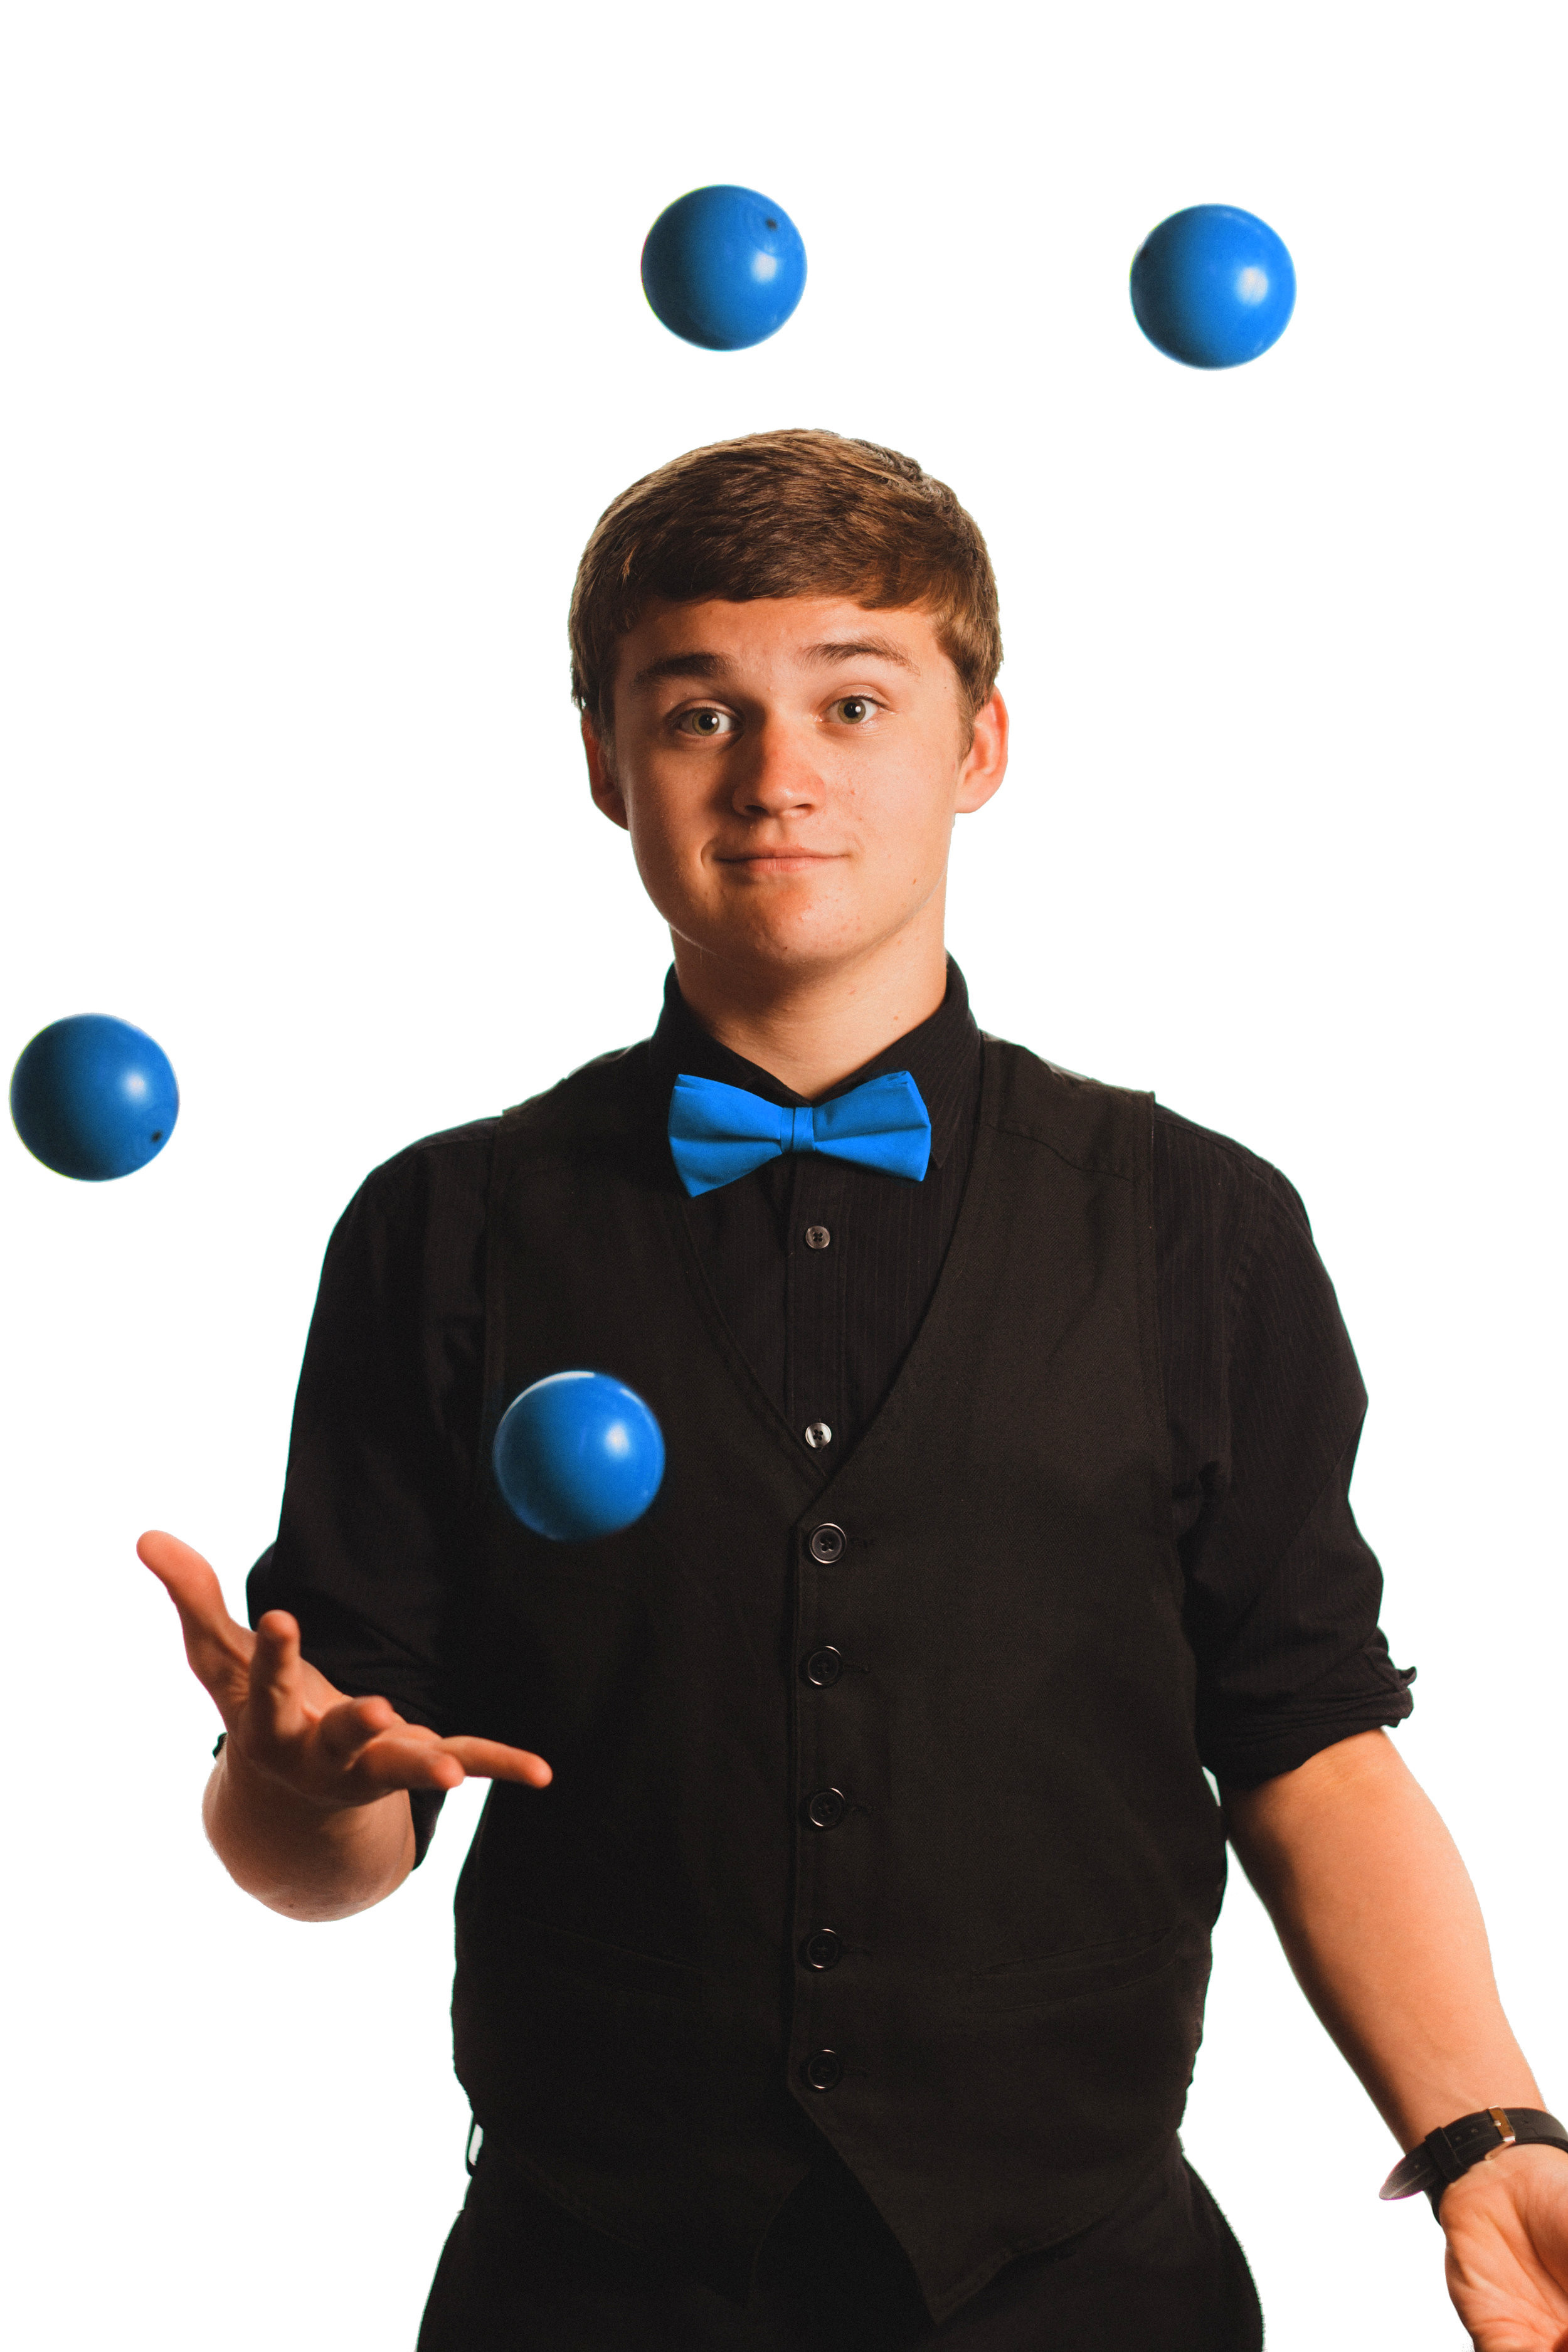 Juggling 5 balls BLUEx.jpg